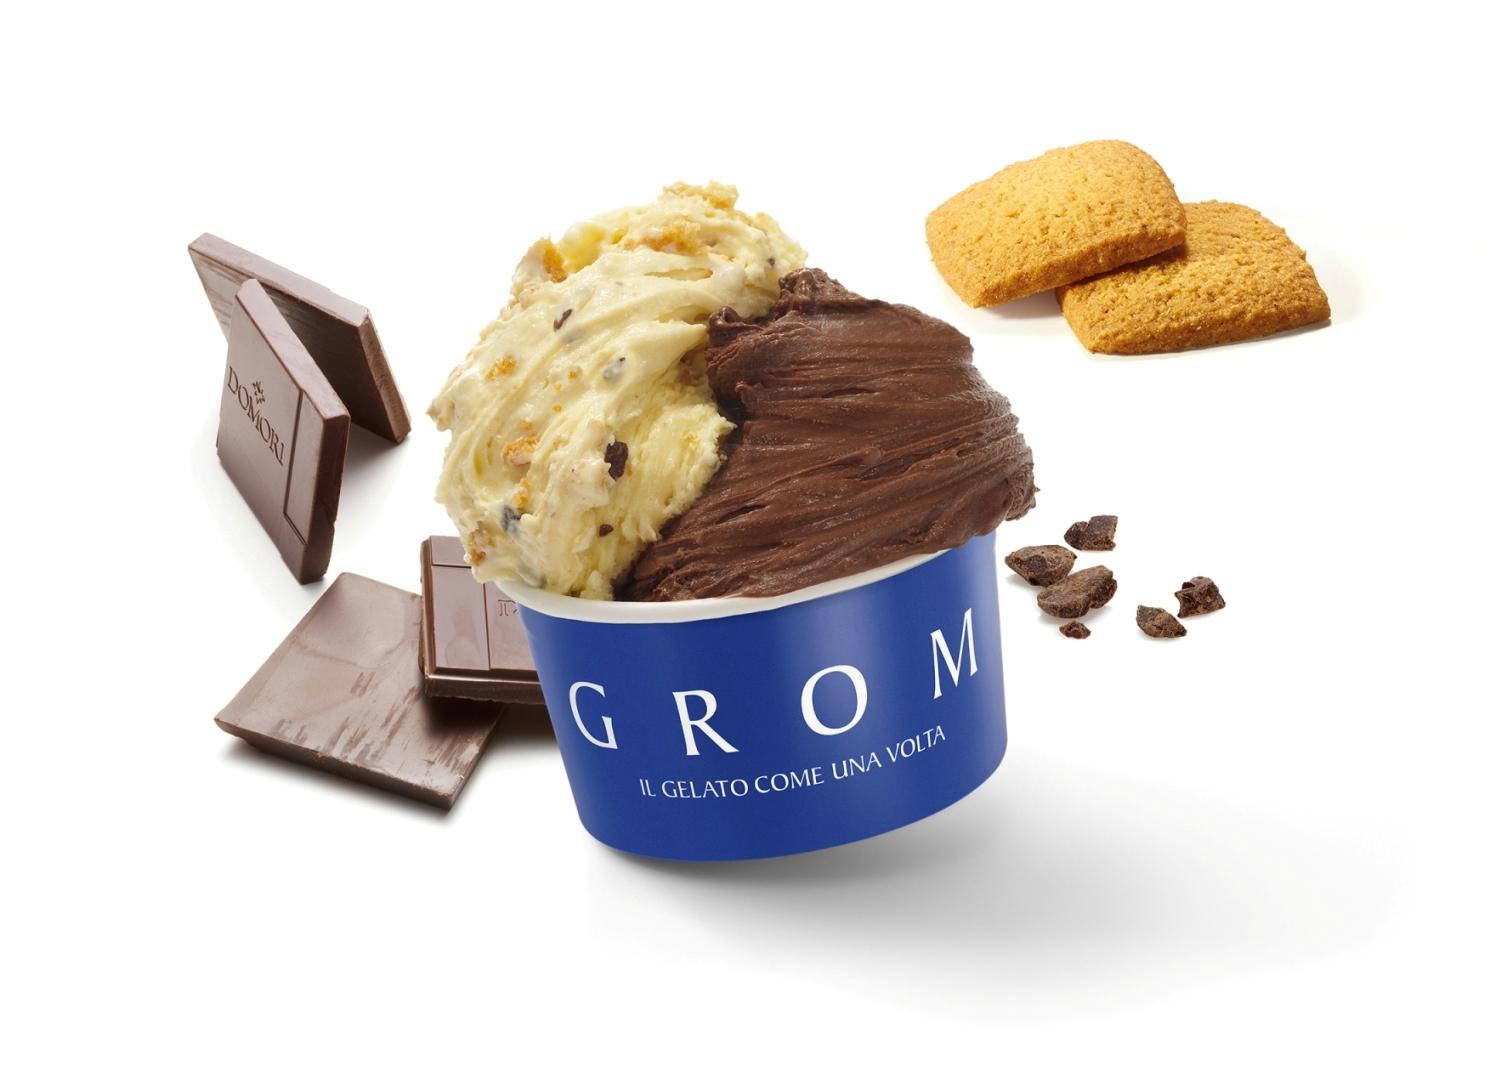 photo-2_grom_crema-di-grom-and-cioccolato-foundente_mini-hk35_small-hk59_medium-hk69_resized